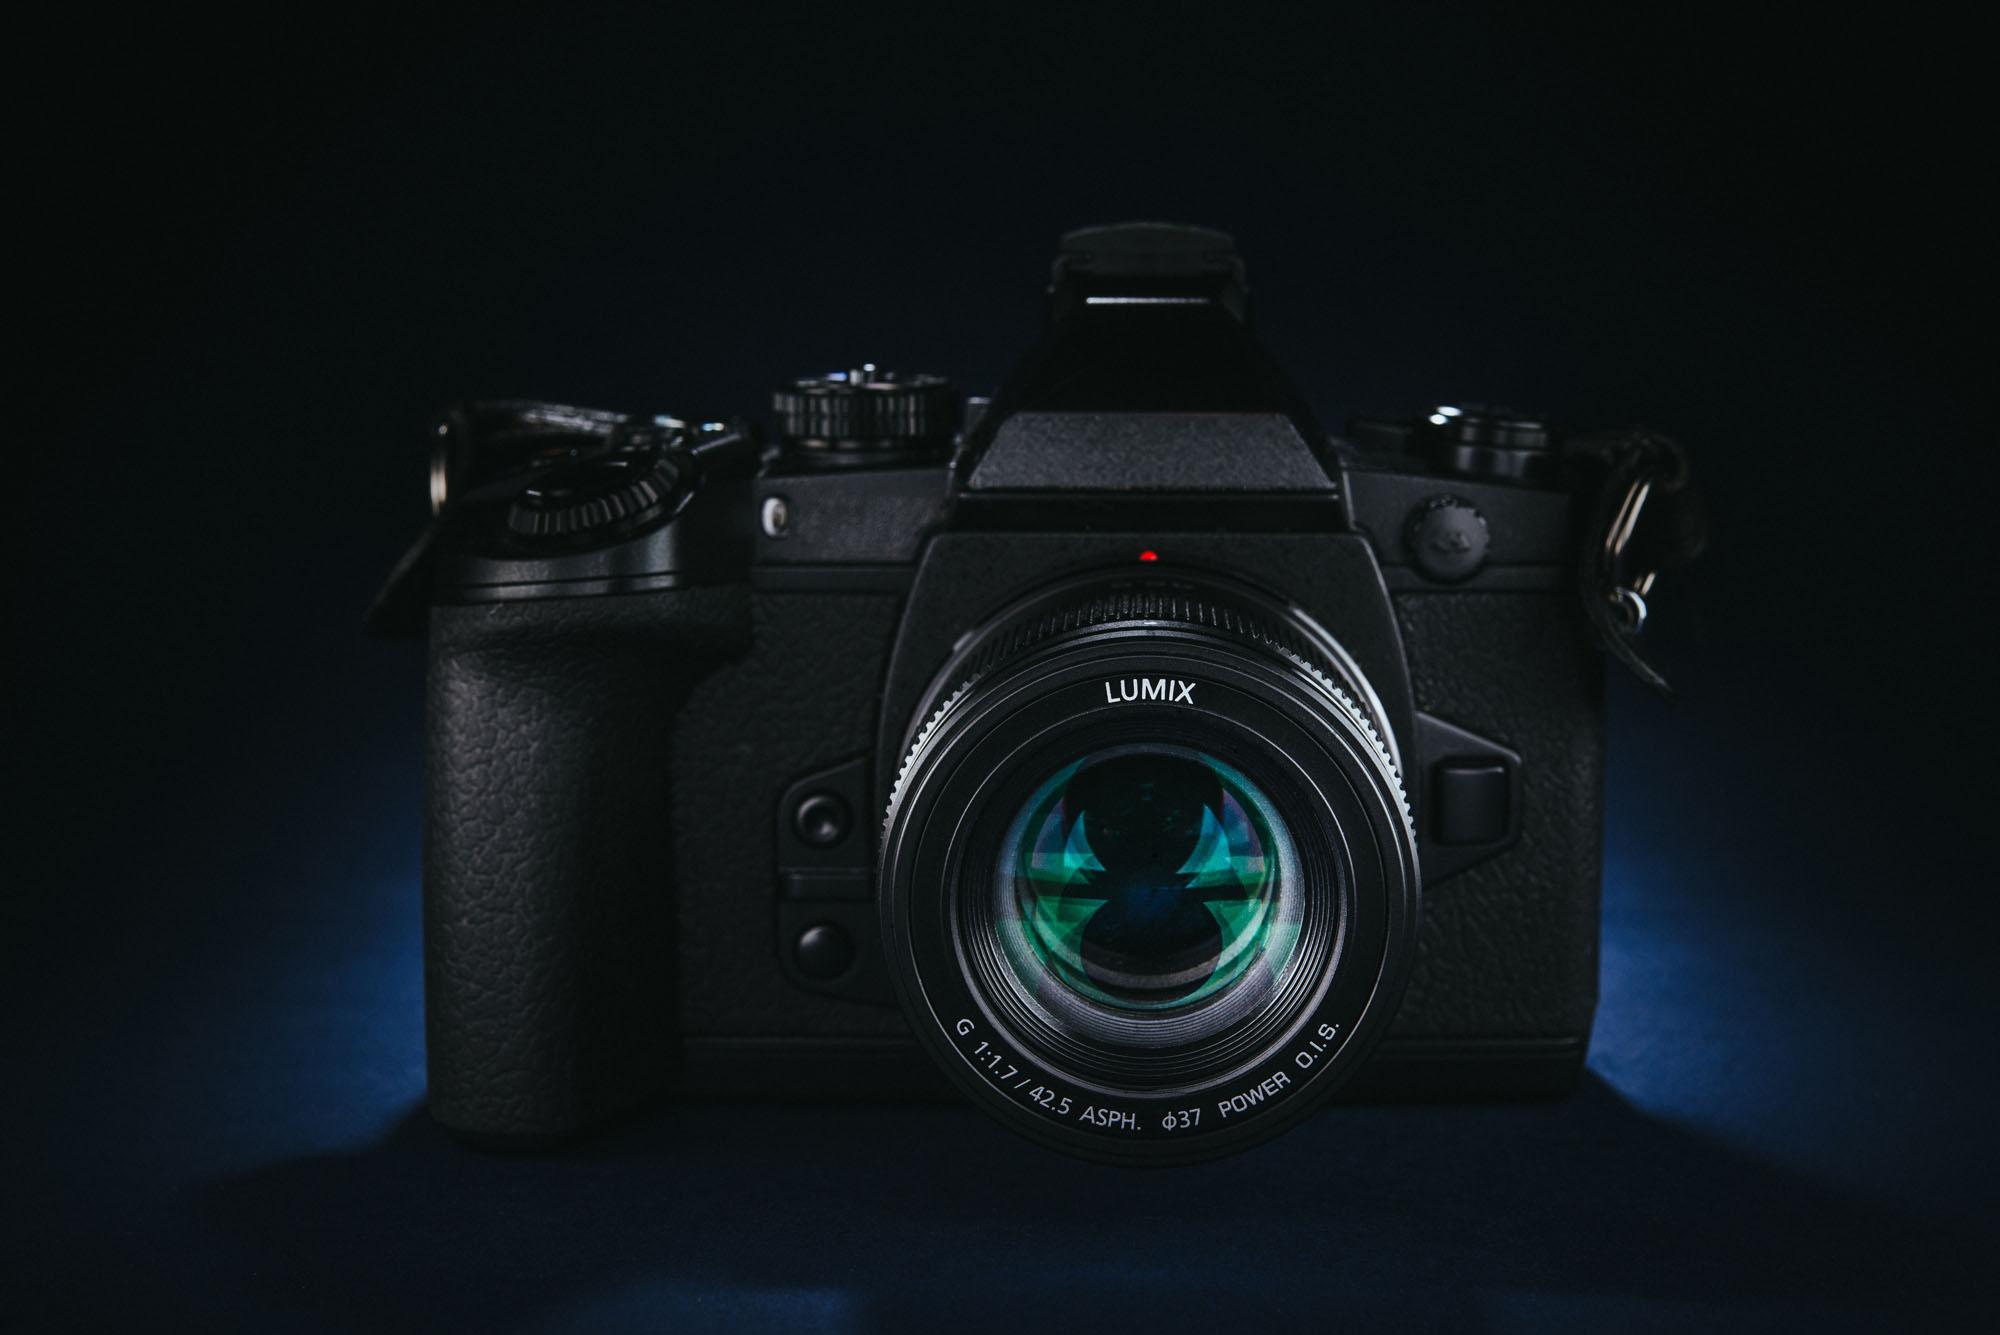 Panasonic_Lumix_42.5mm_f1.7_review_03